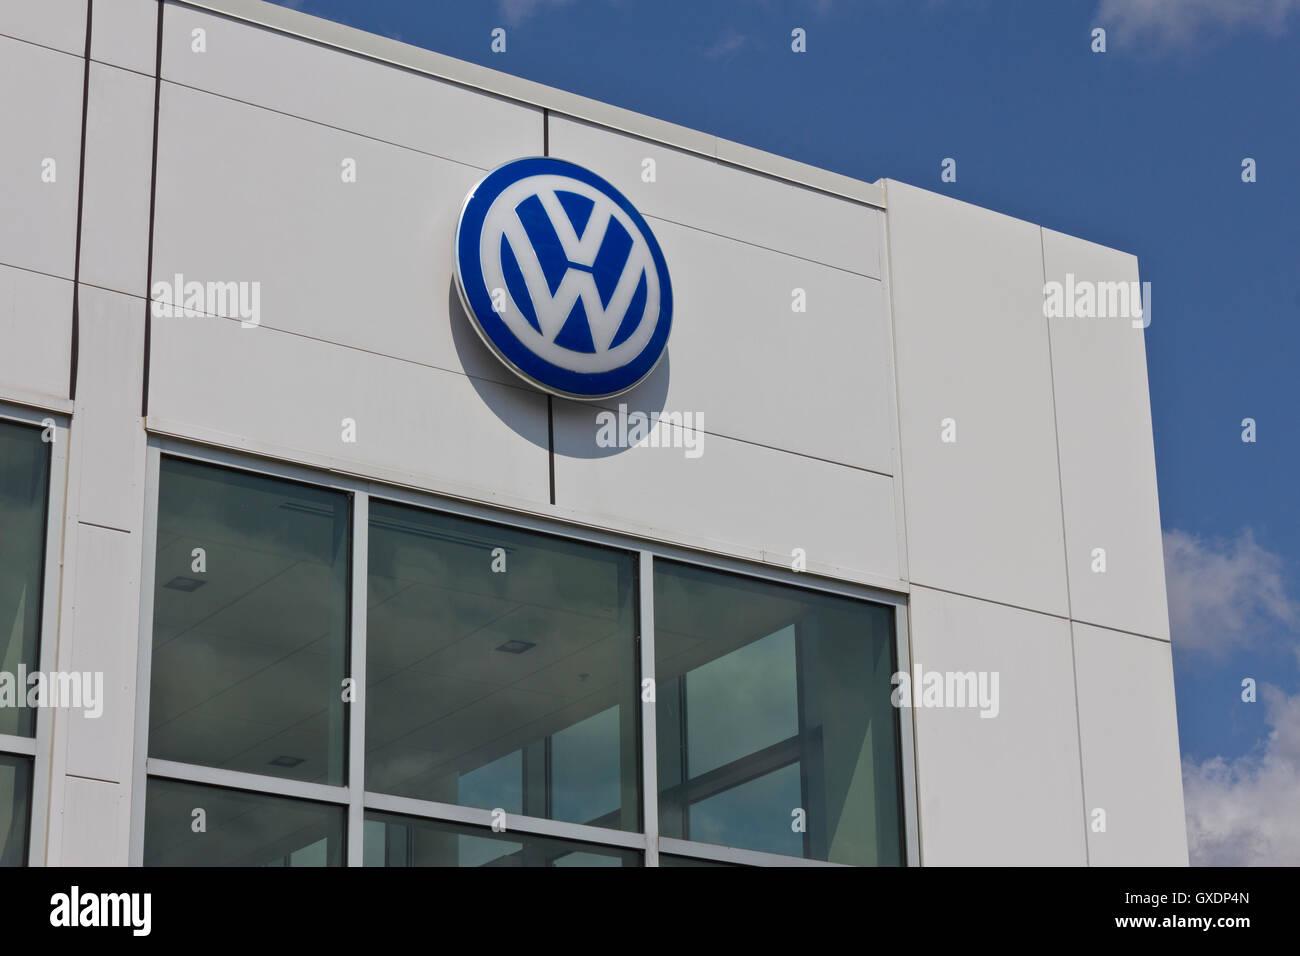 Vw Cars Stock Photos Amp Vw Cars Stock Images Alamy